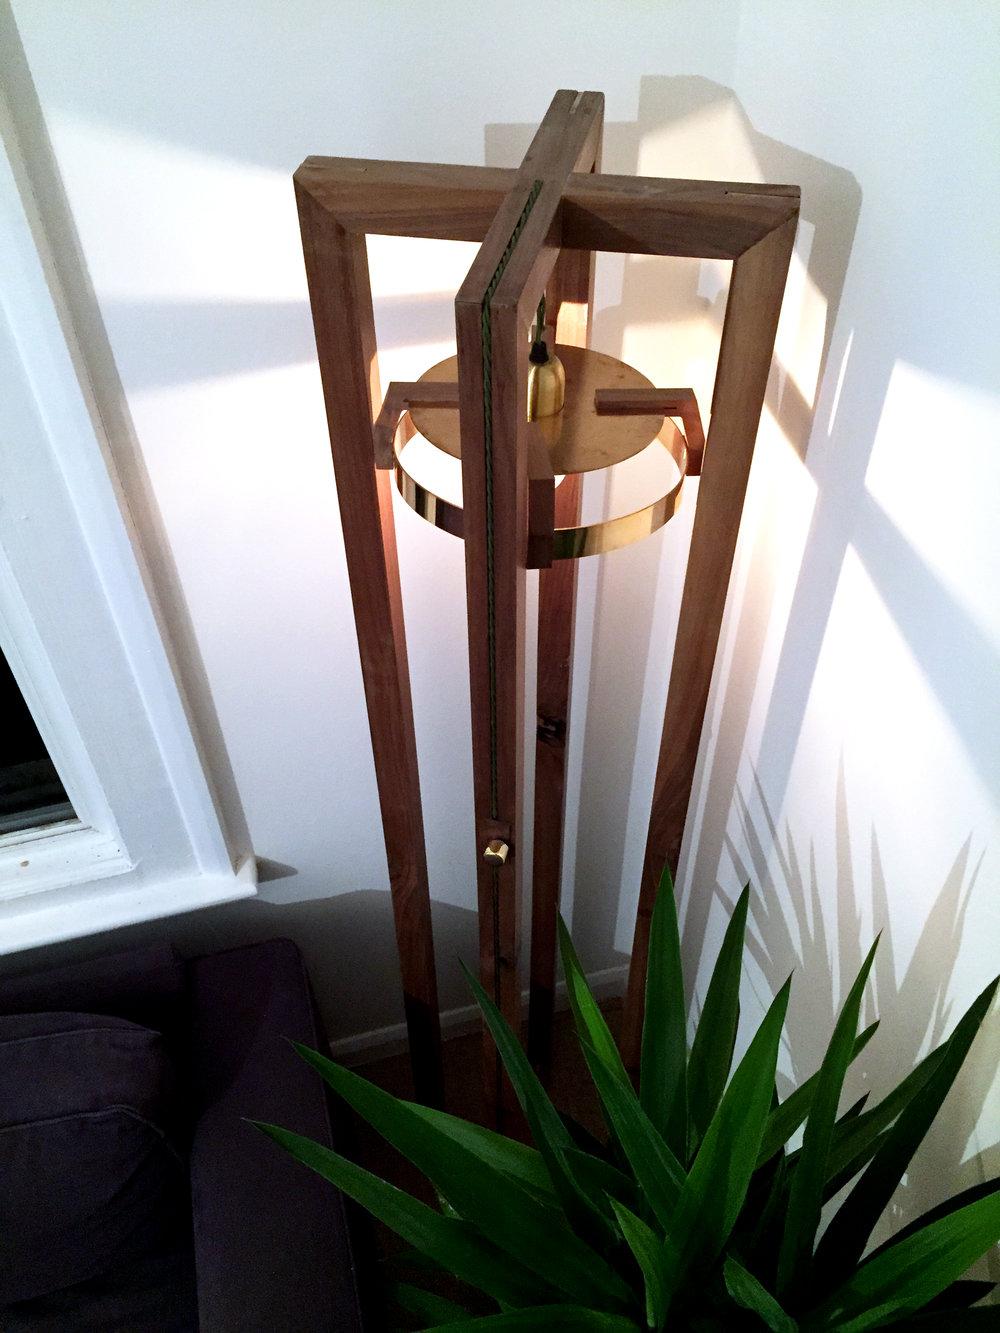 Mitre LAMP - Bespoke Walnut and brass floor lamp